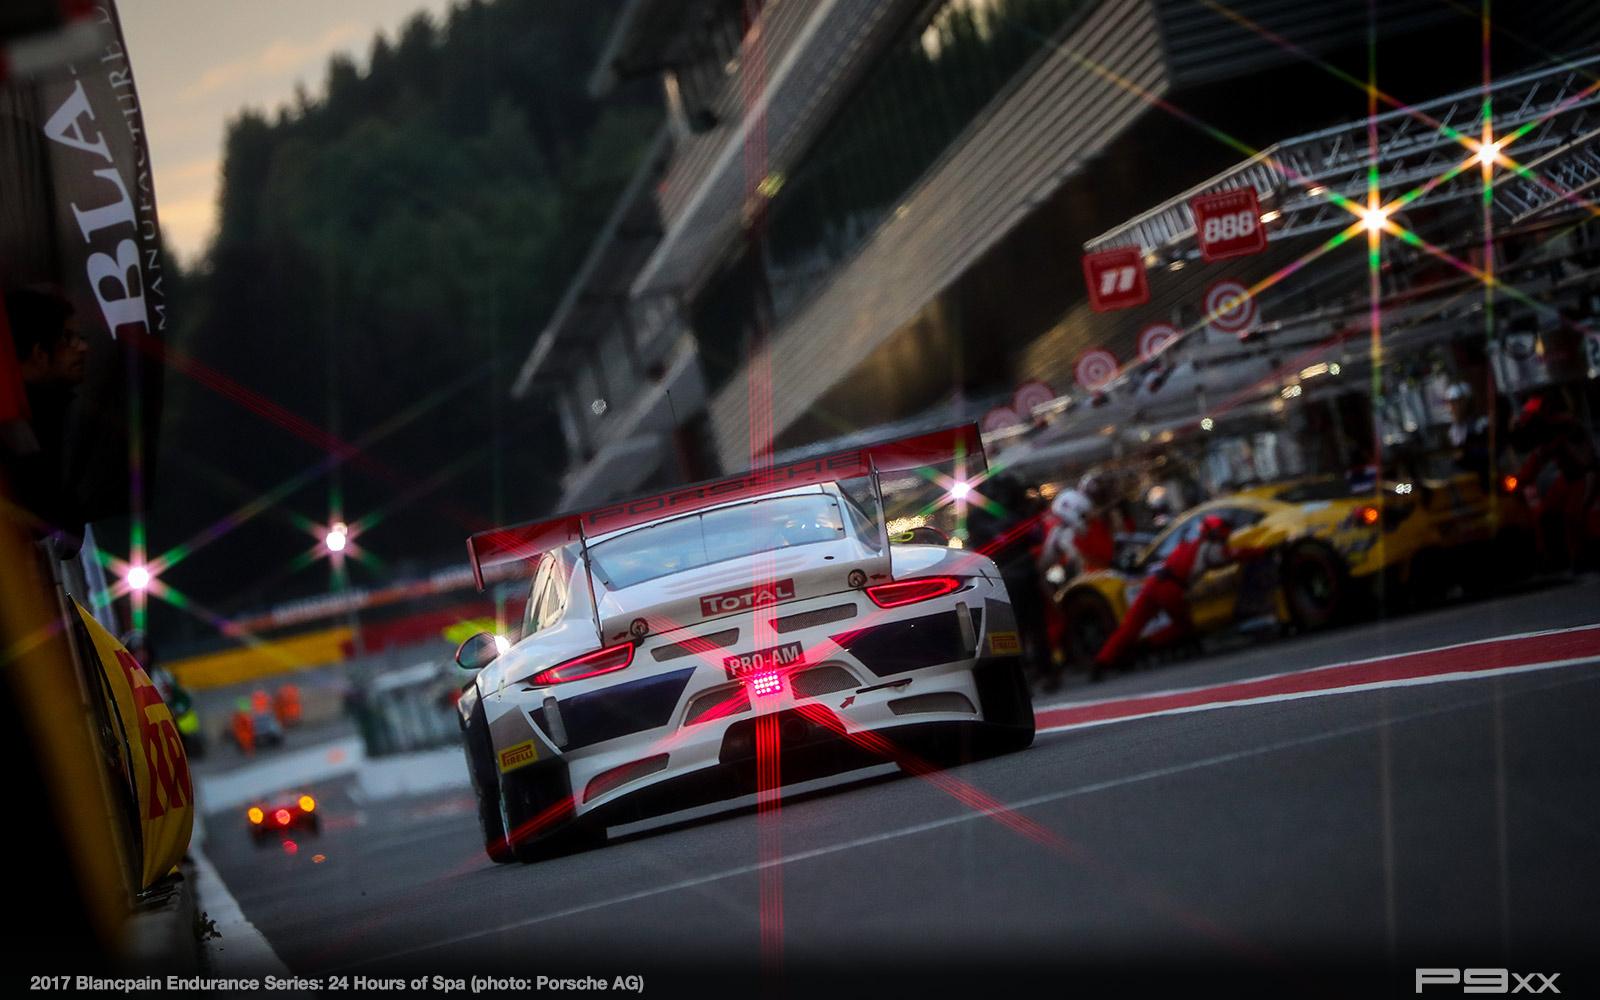 2017-24-Hours-of-Spa-Porsche-319